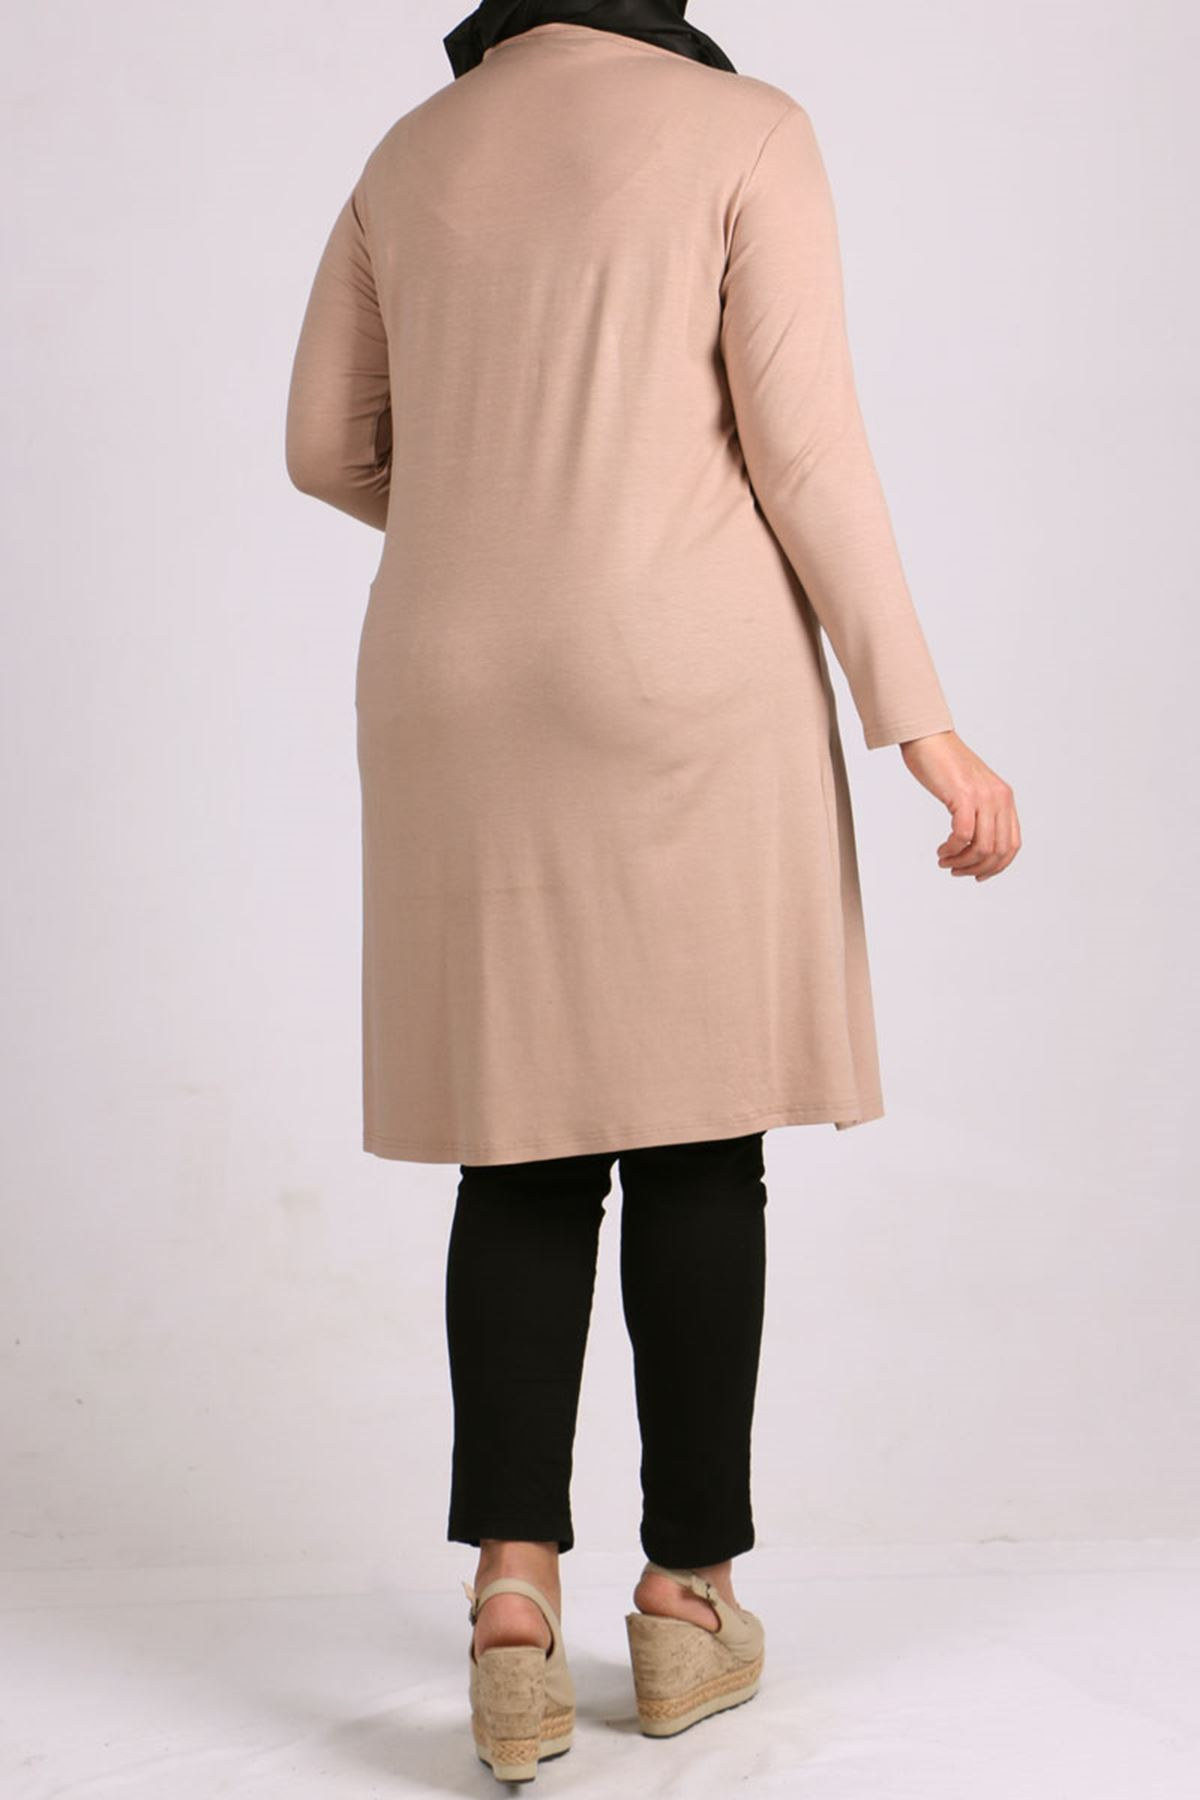 8451 Plus Size Tunic - Stone